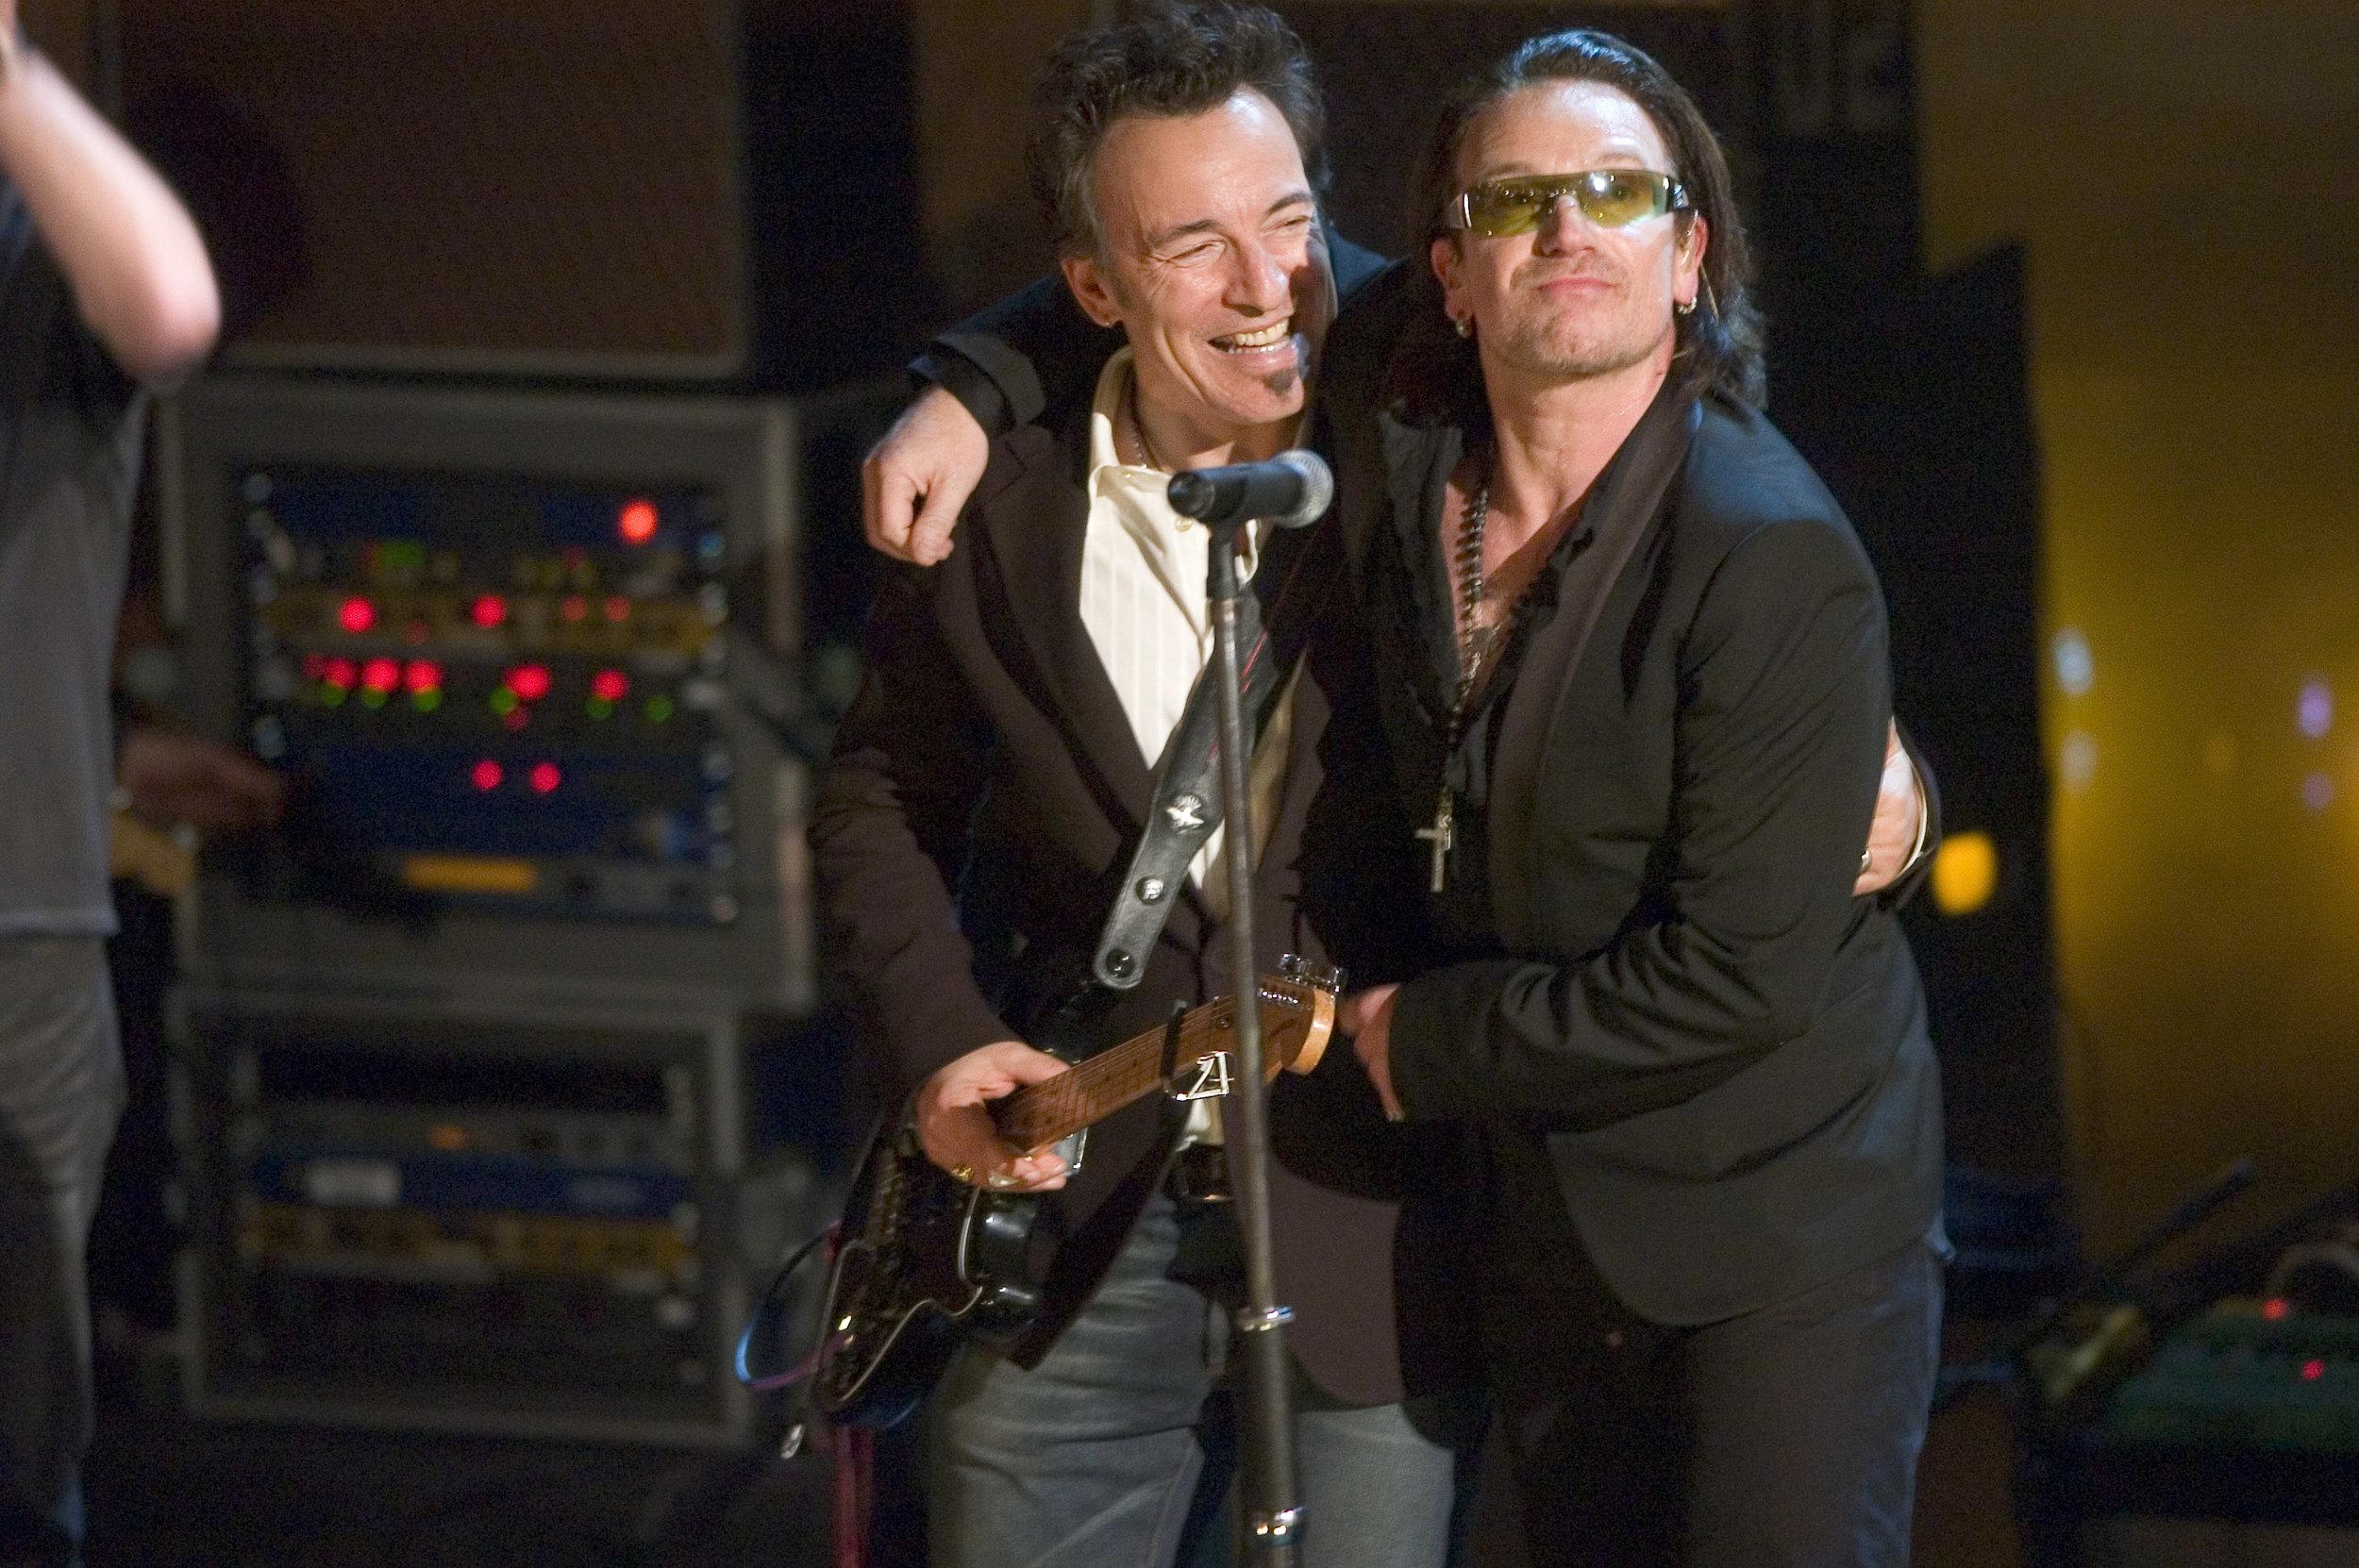 Bruce and Bono_67.jpg